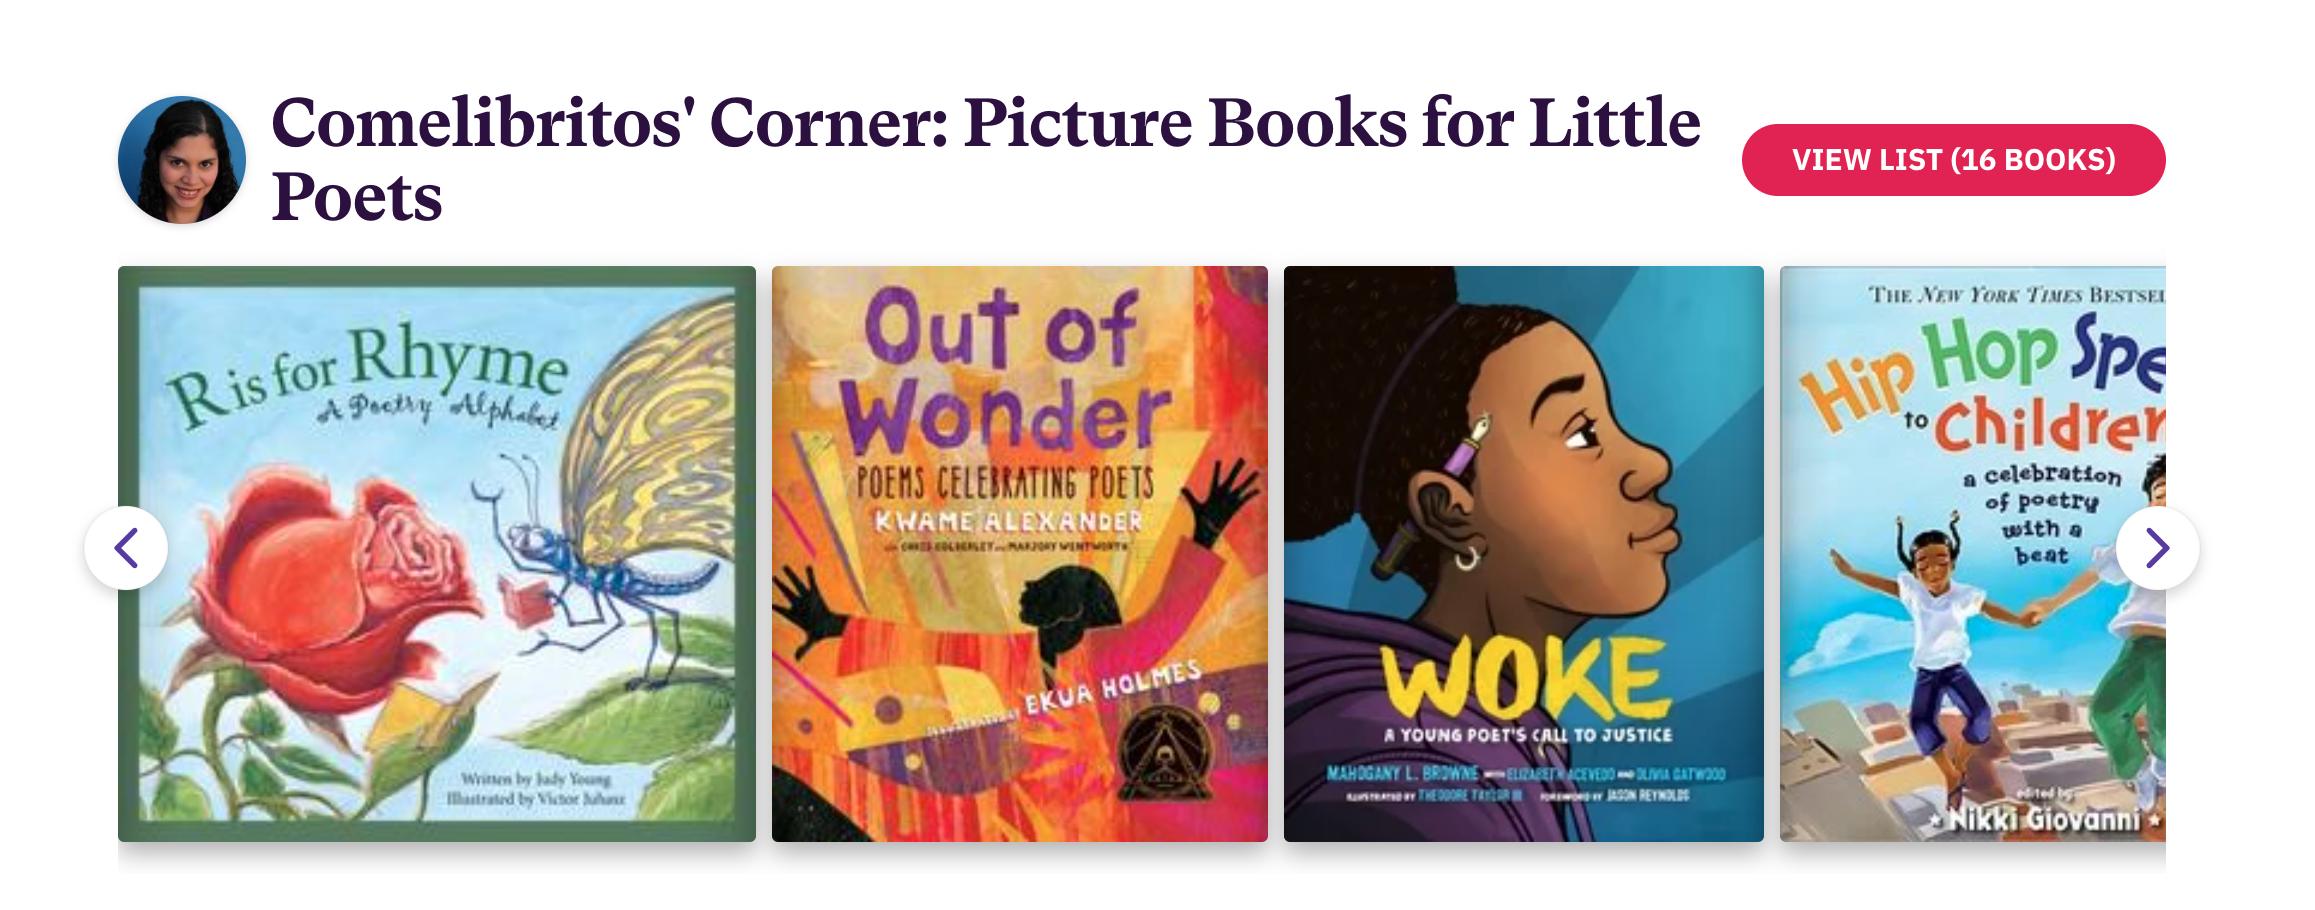 Bookshop List: Comelibritos' Corner: Picture Books for Little Poets